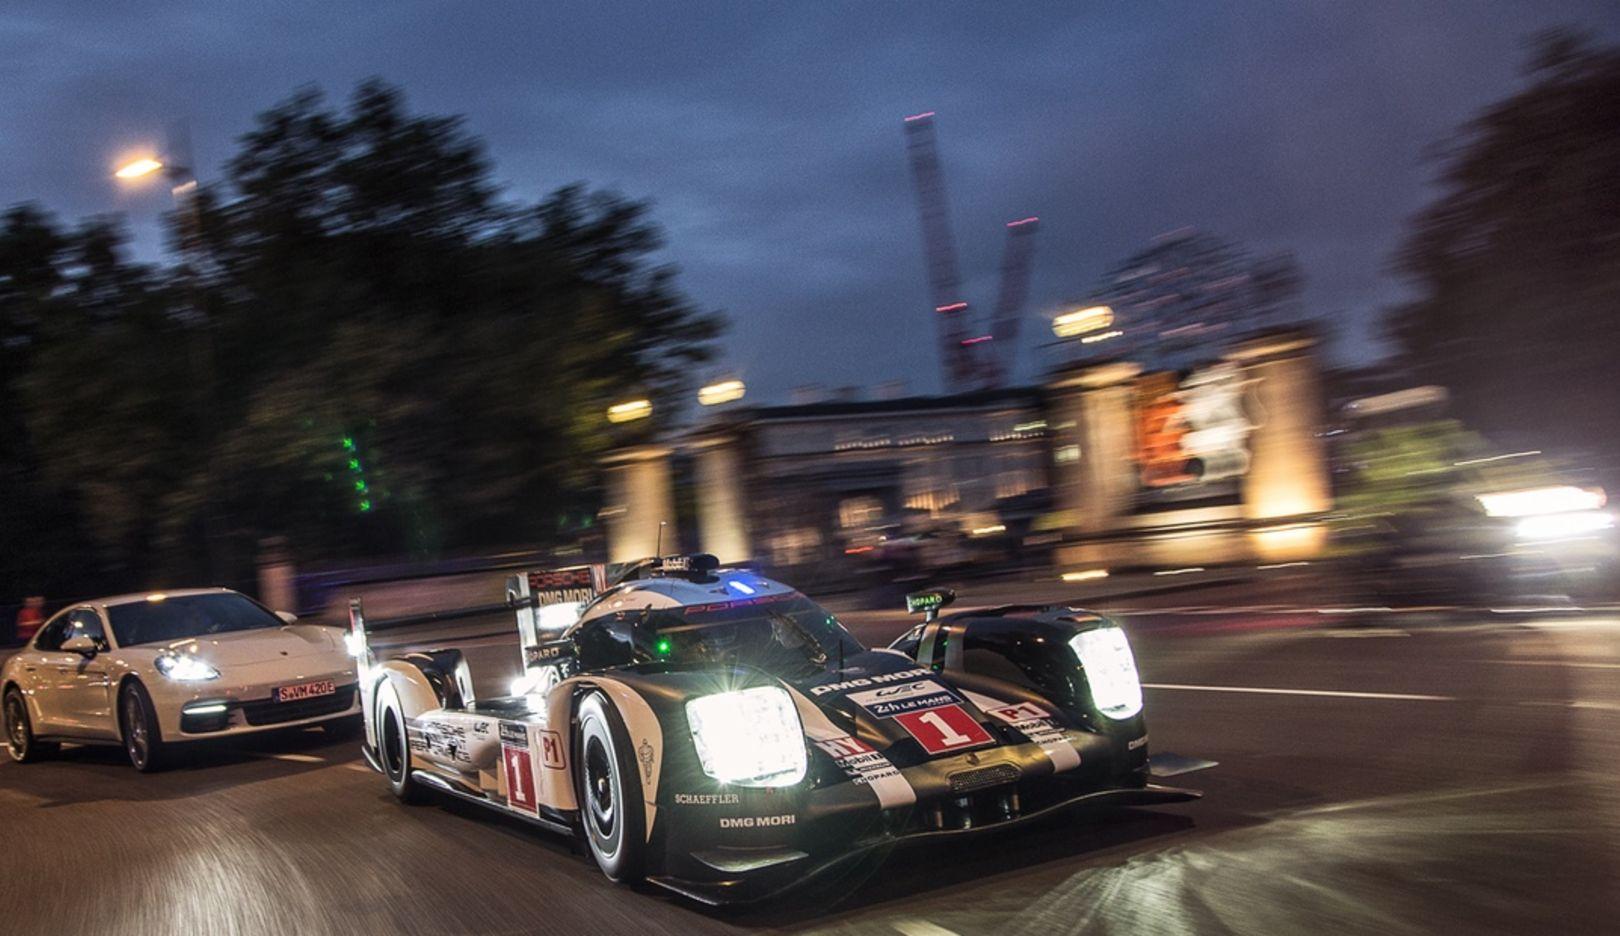 919 Hybrid, Panamera 4 E-Hybrid, London, 2016, Porsche AG